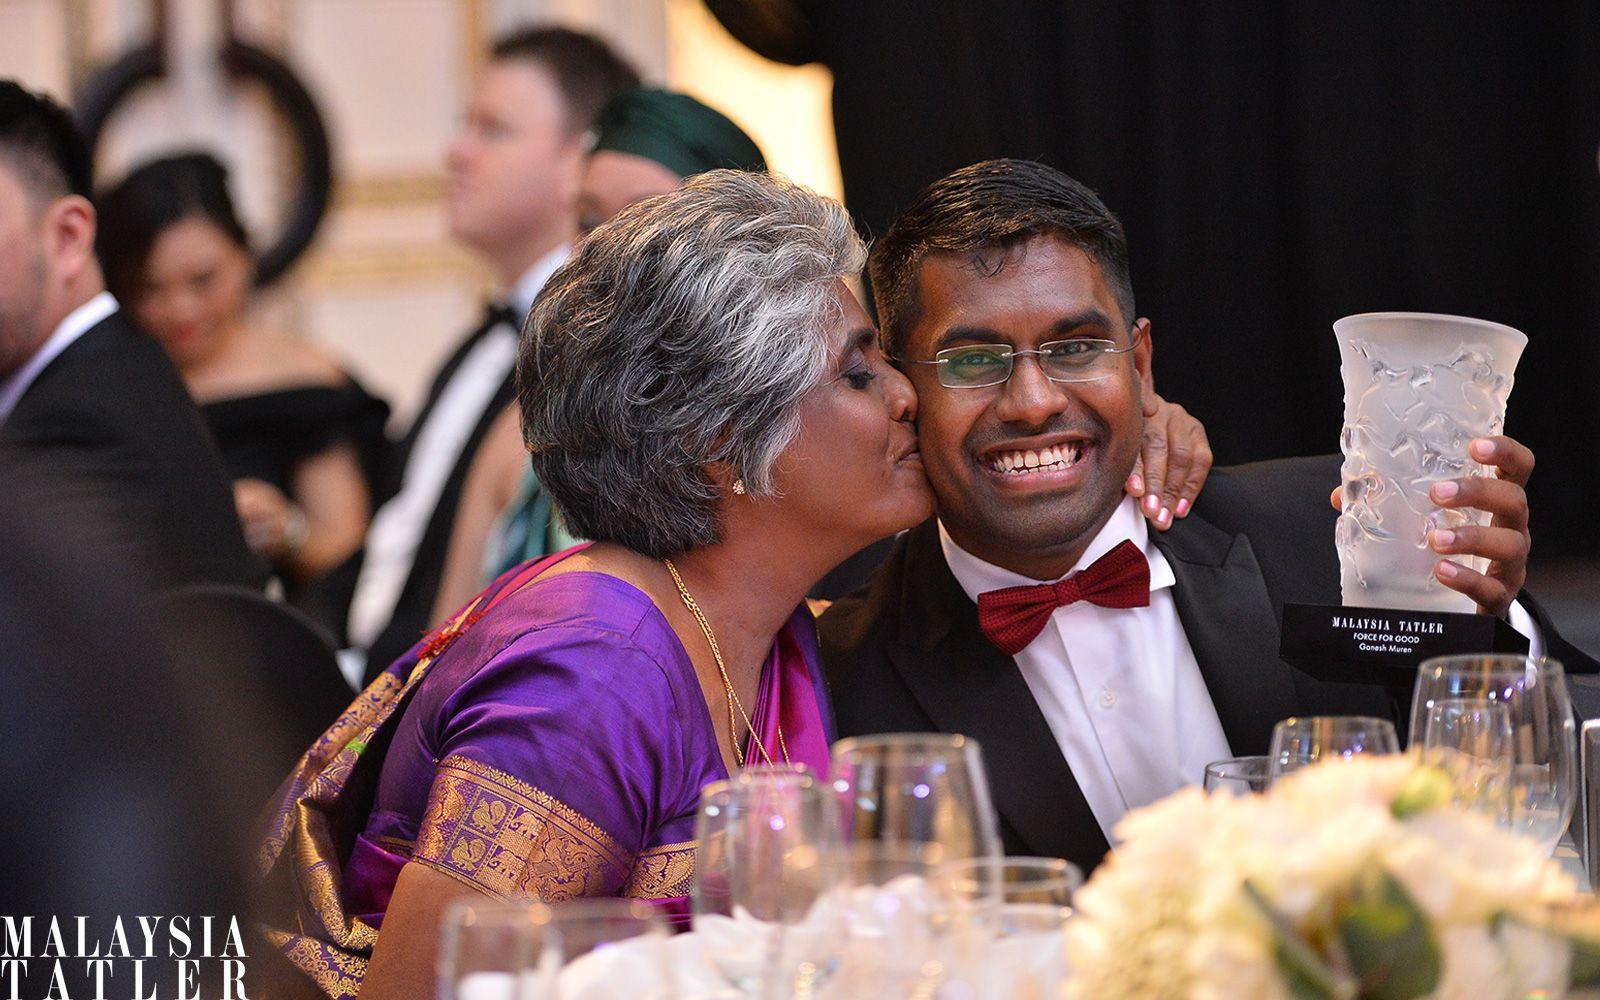 Premah Chellapan and Ganesh Muren